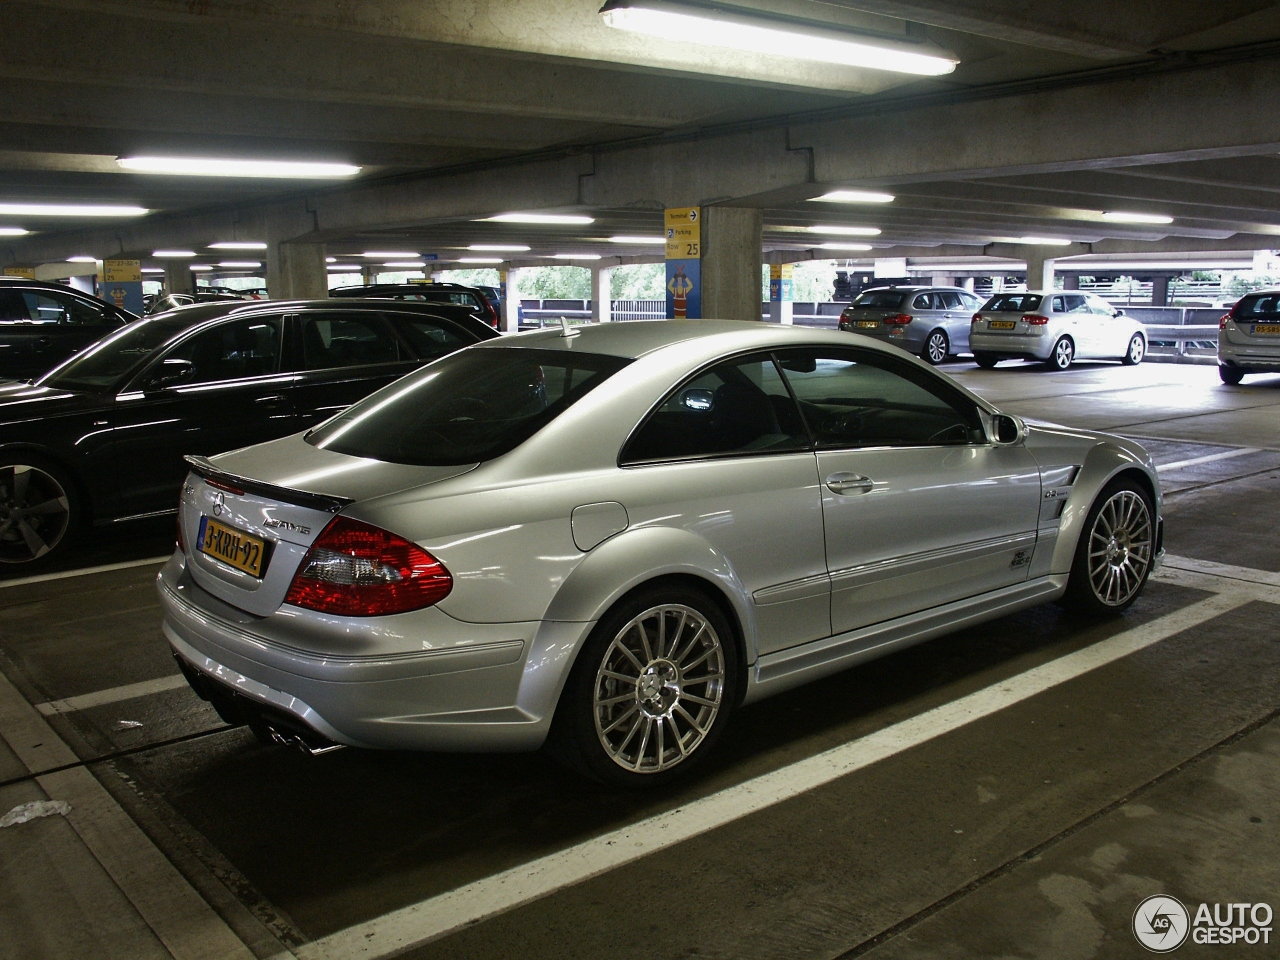 Mercedes benz clk 63 amg black series 29 juli 2016 for Mercedes benz clk63 amg black series